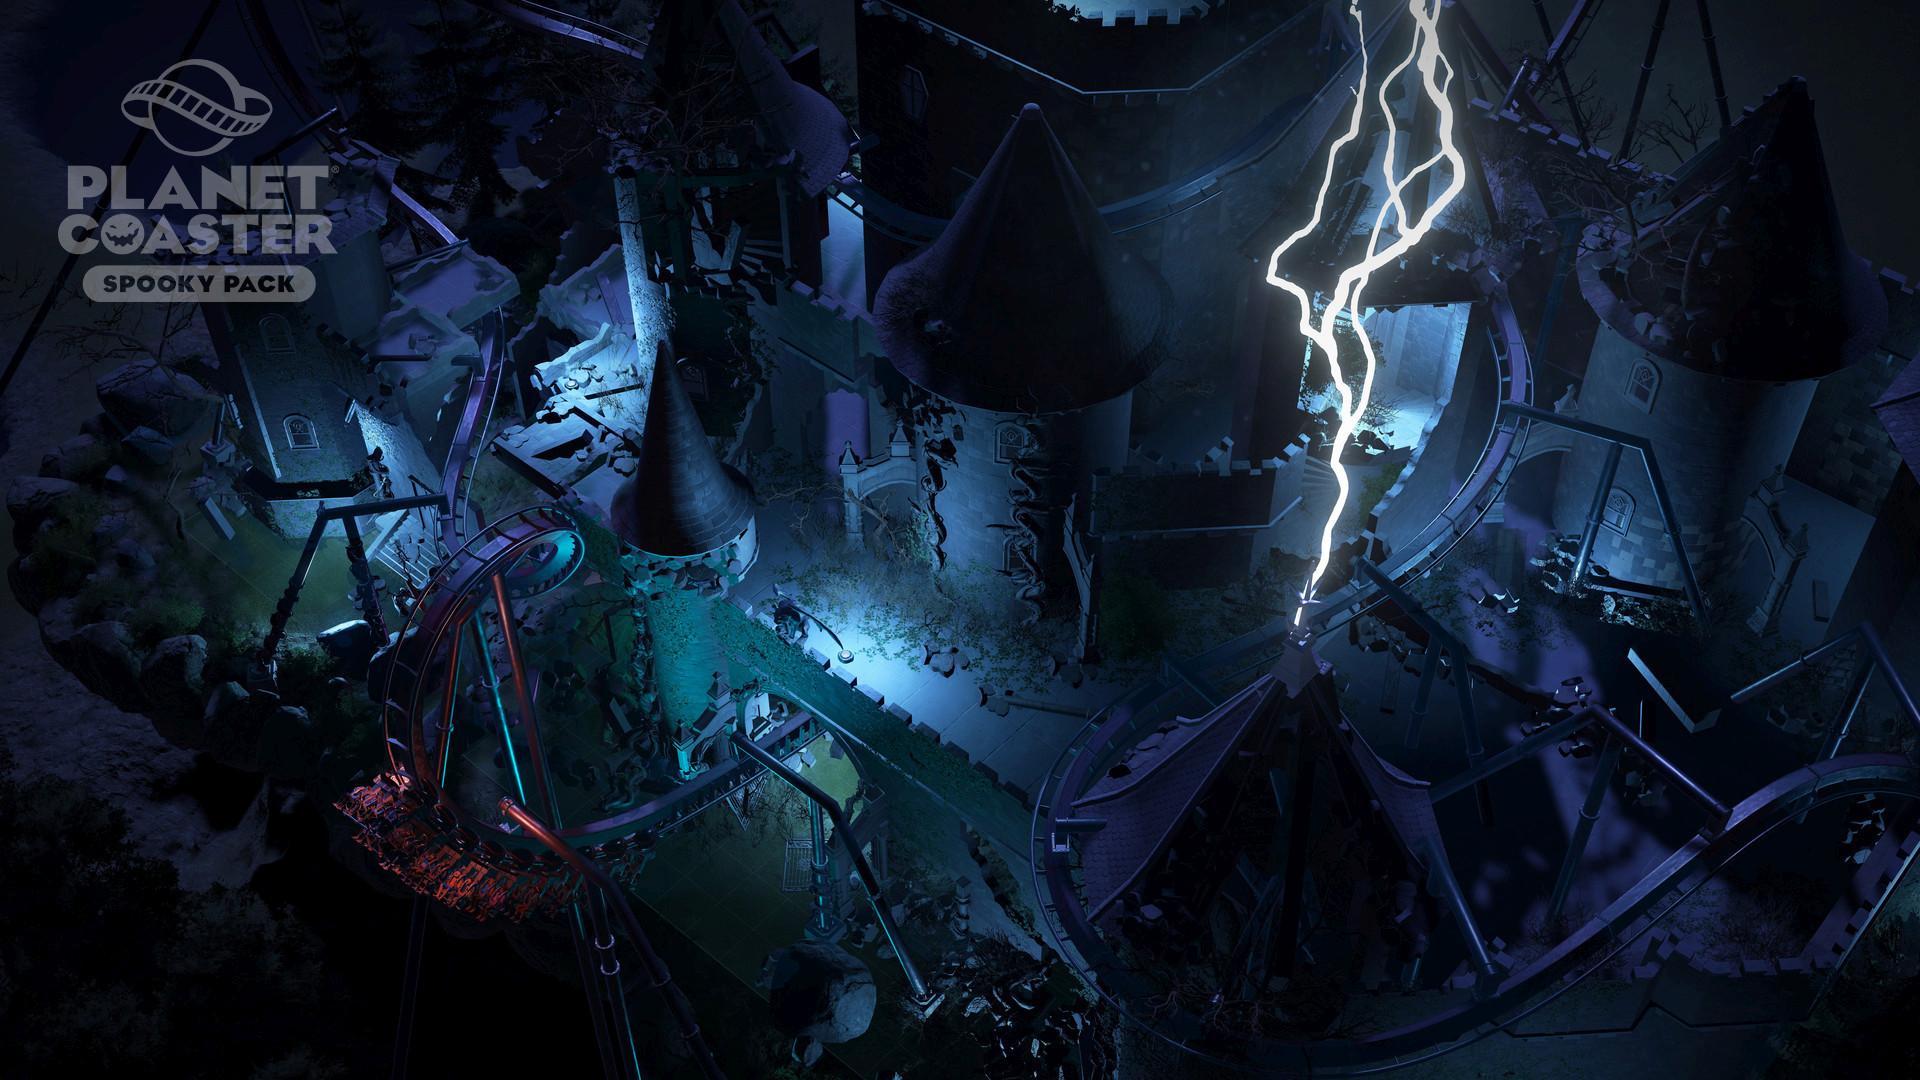 سی دی کی اریجینال استیم Planet Coaster - Spooky Pack